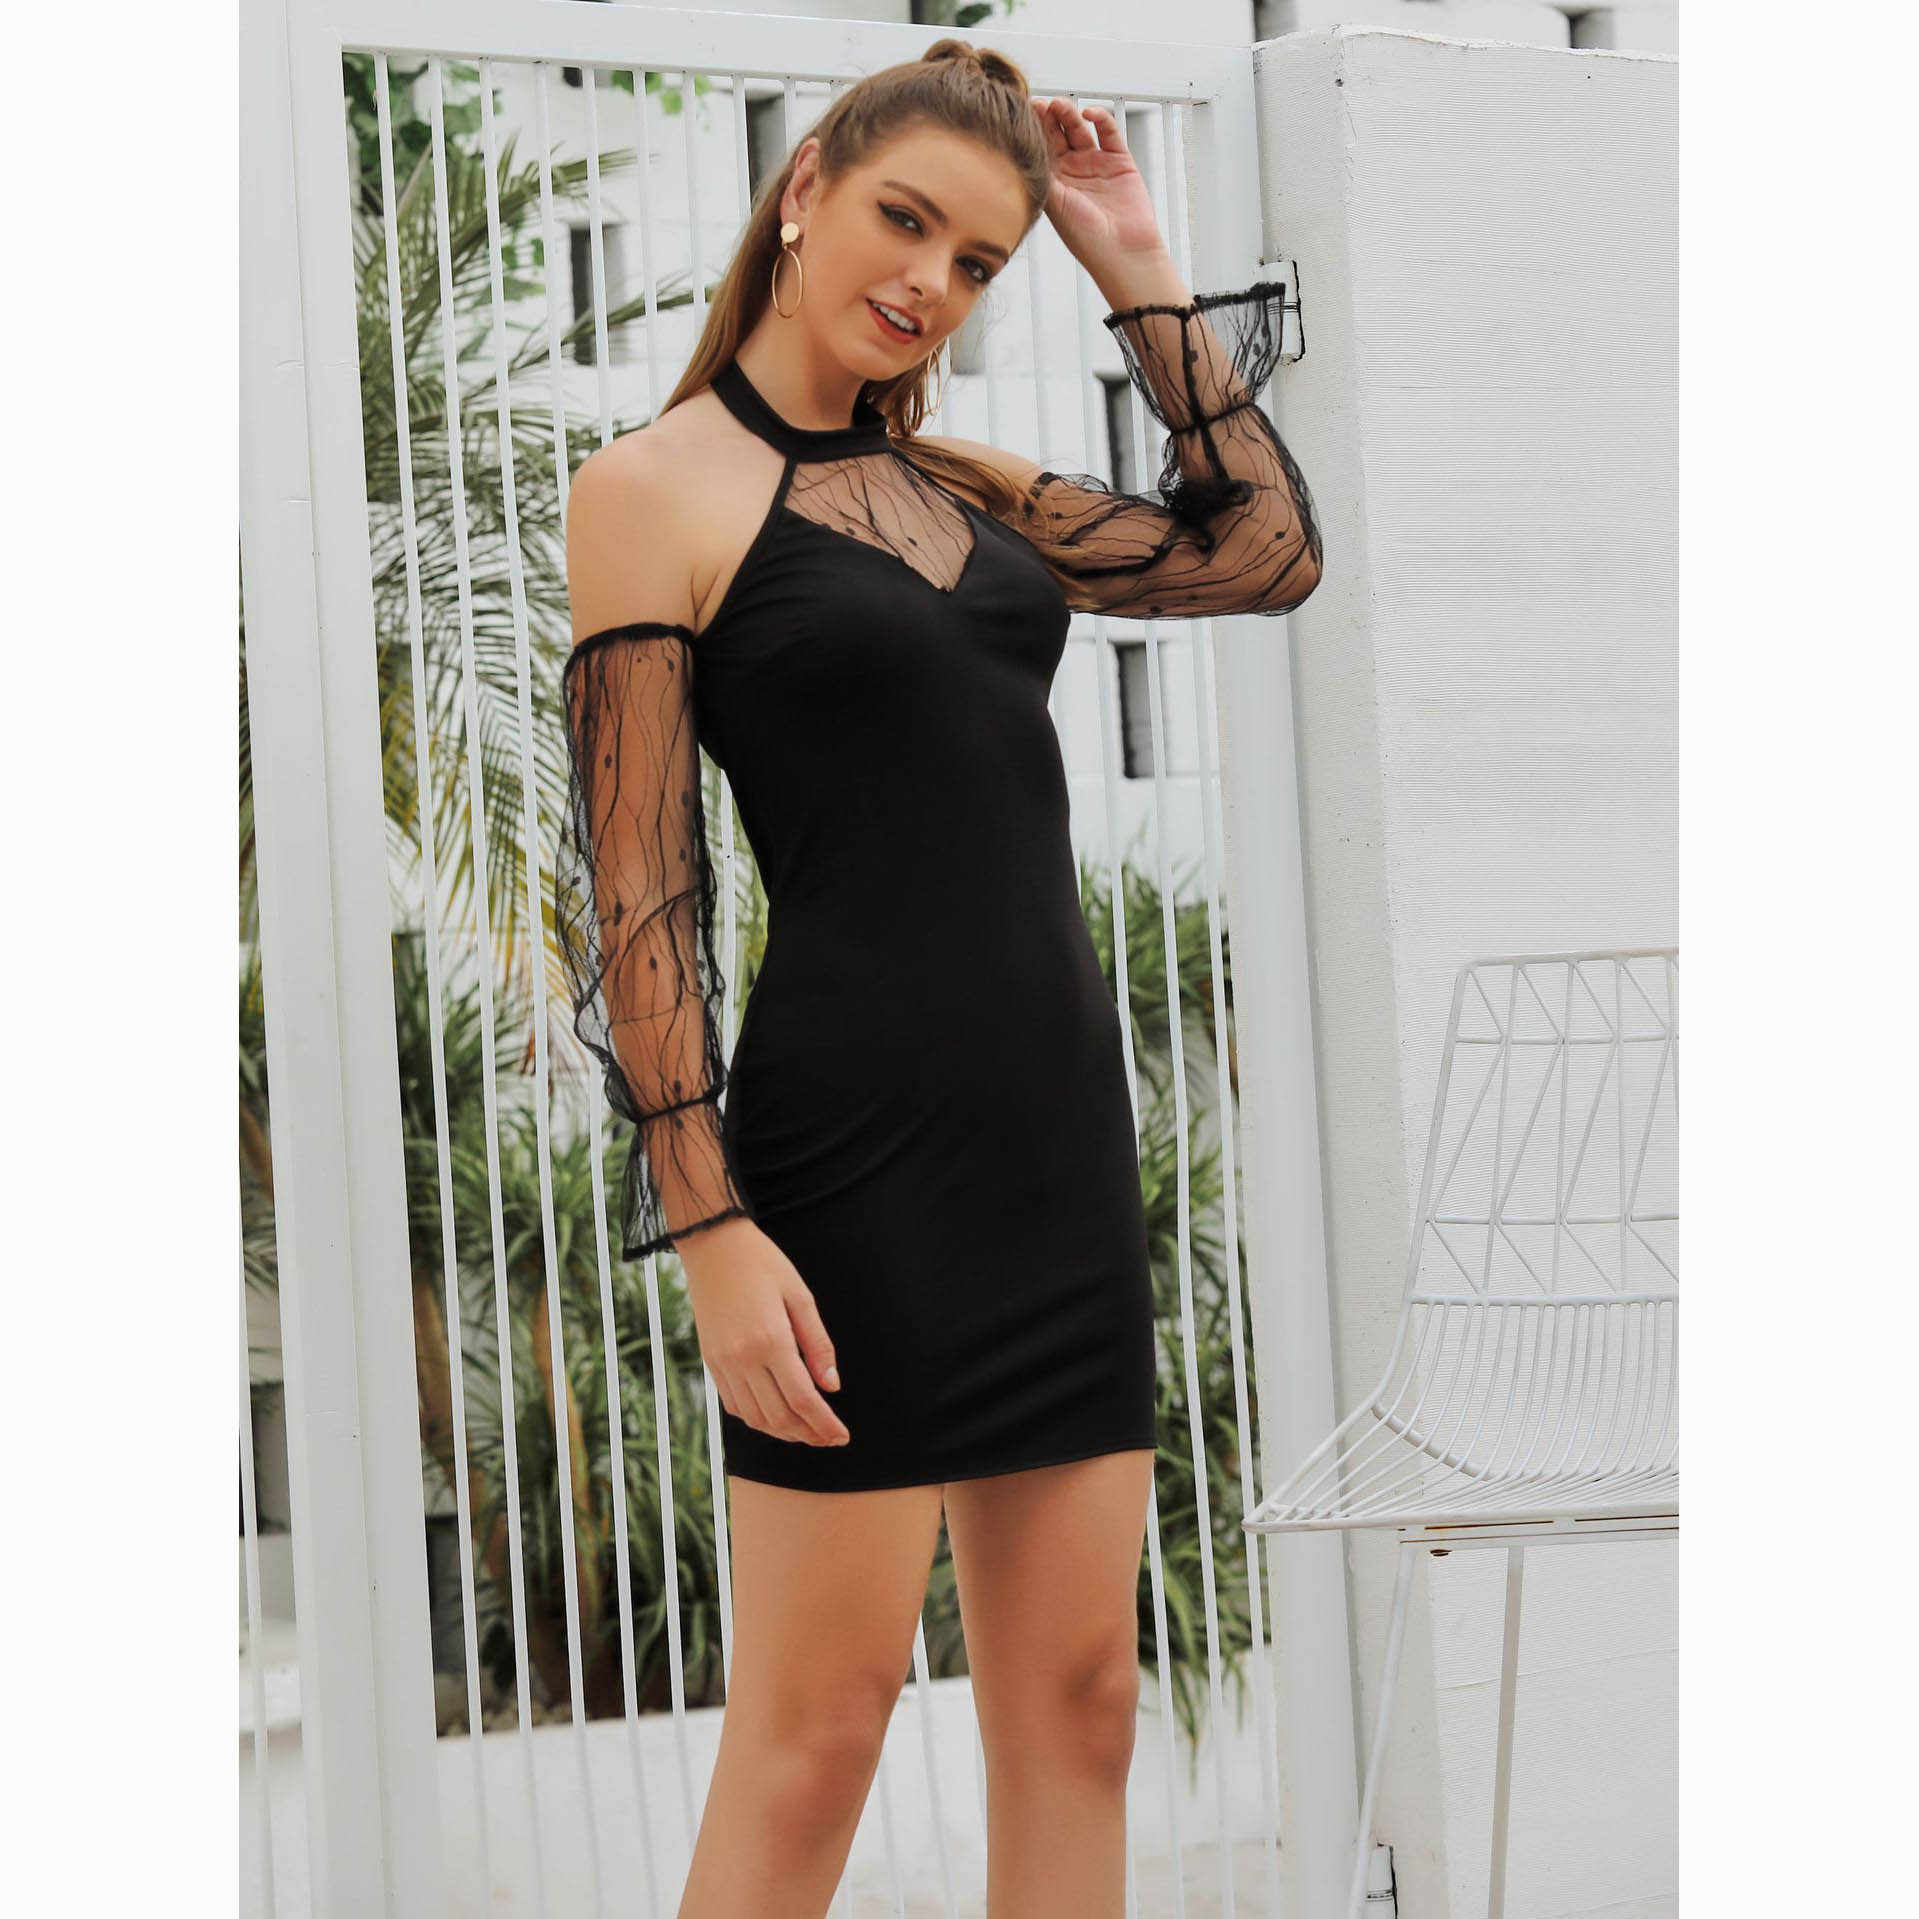 S-XL בתוספת גודל הלטר כבוי כתף תחרה טלאים Bodycon שמלה אלגנטי שמלות אישה מסיבת לילה Vestidos סקסי שחור Minifalda